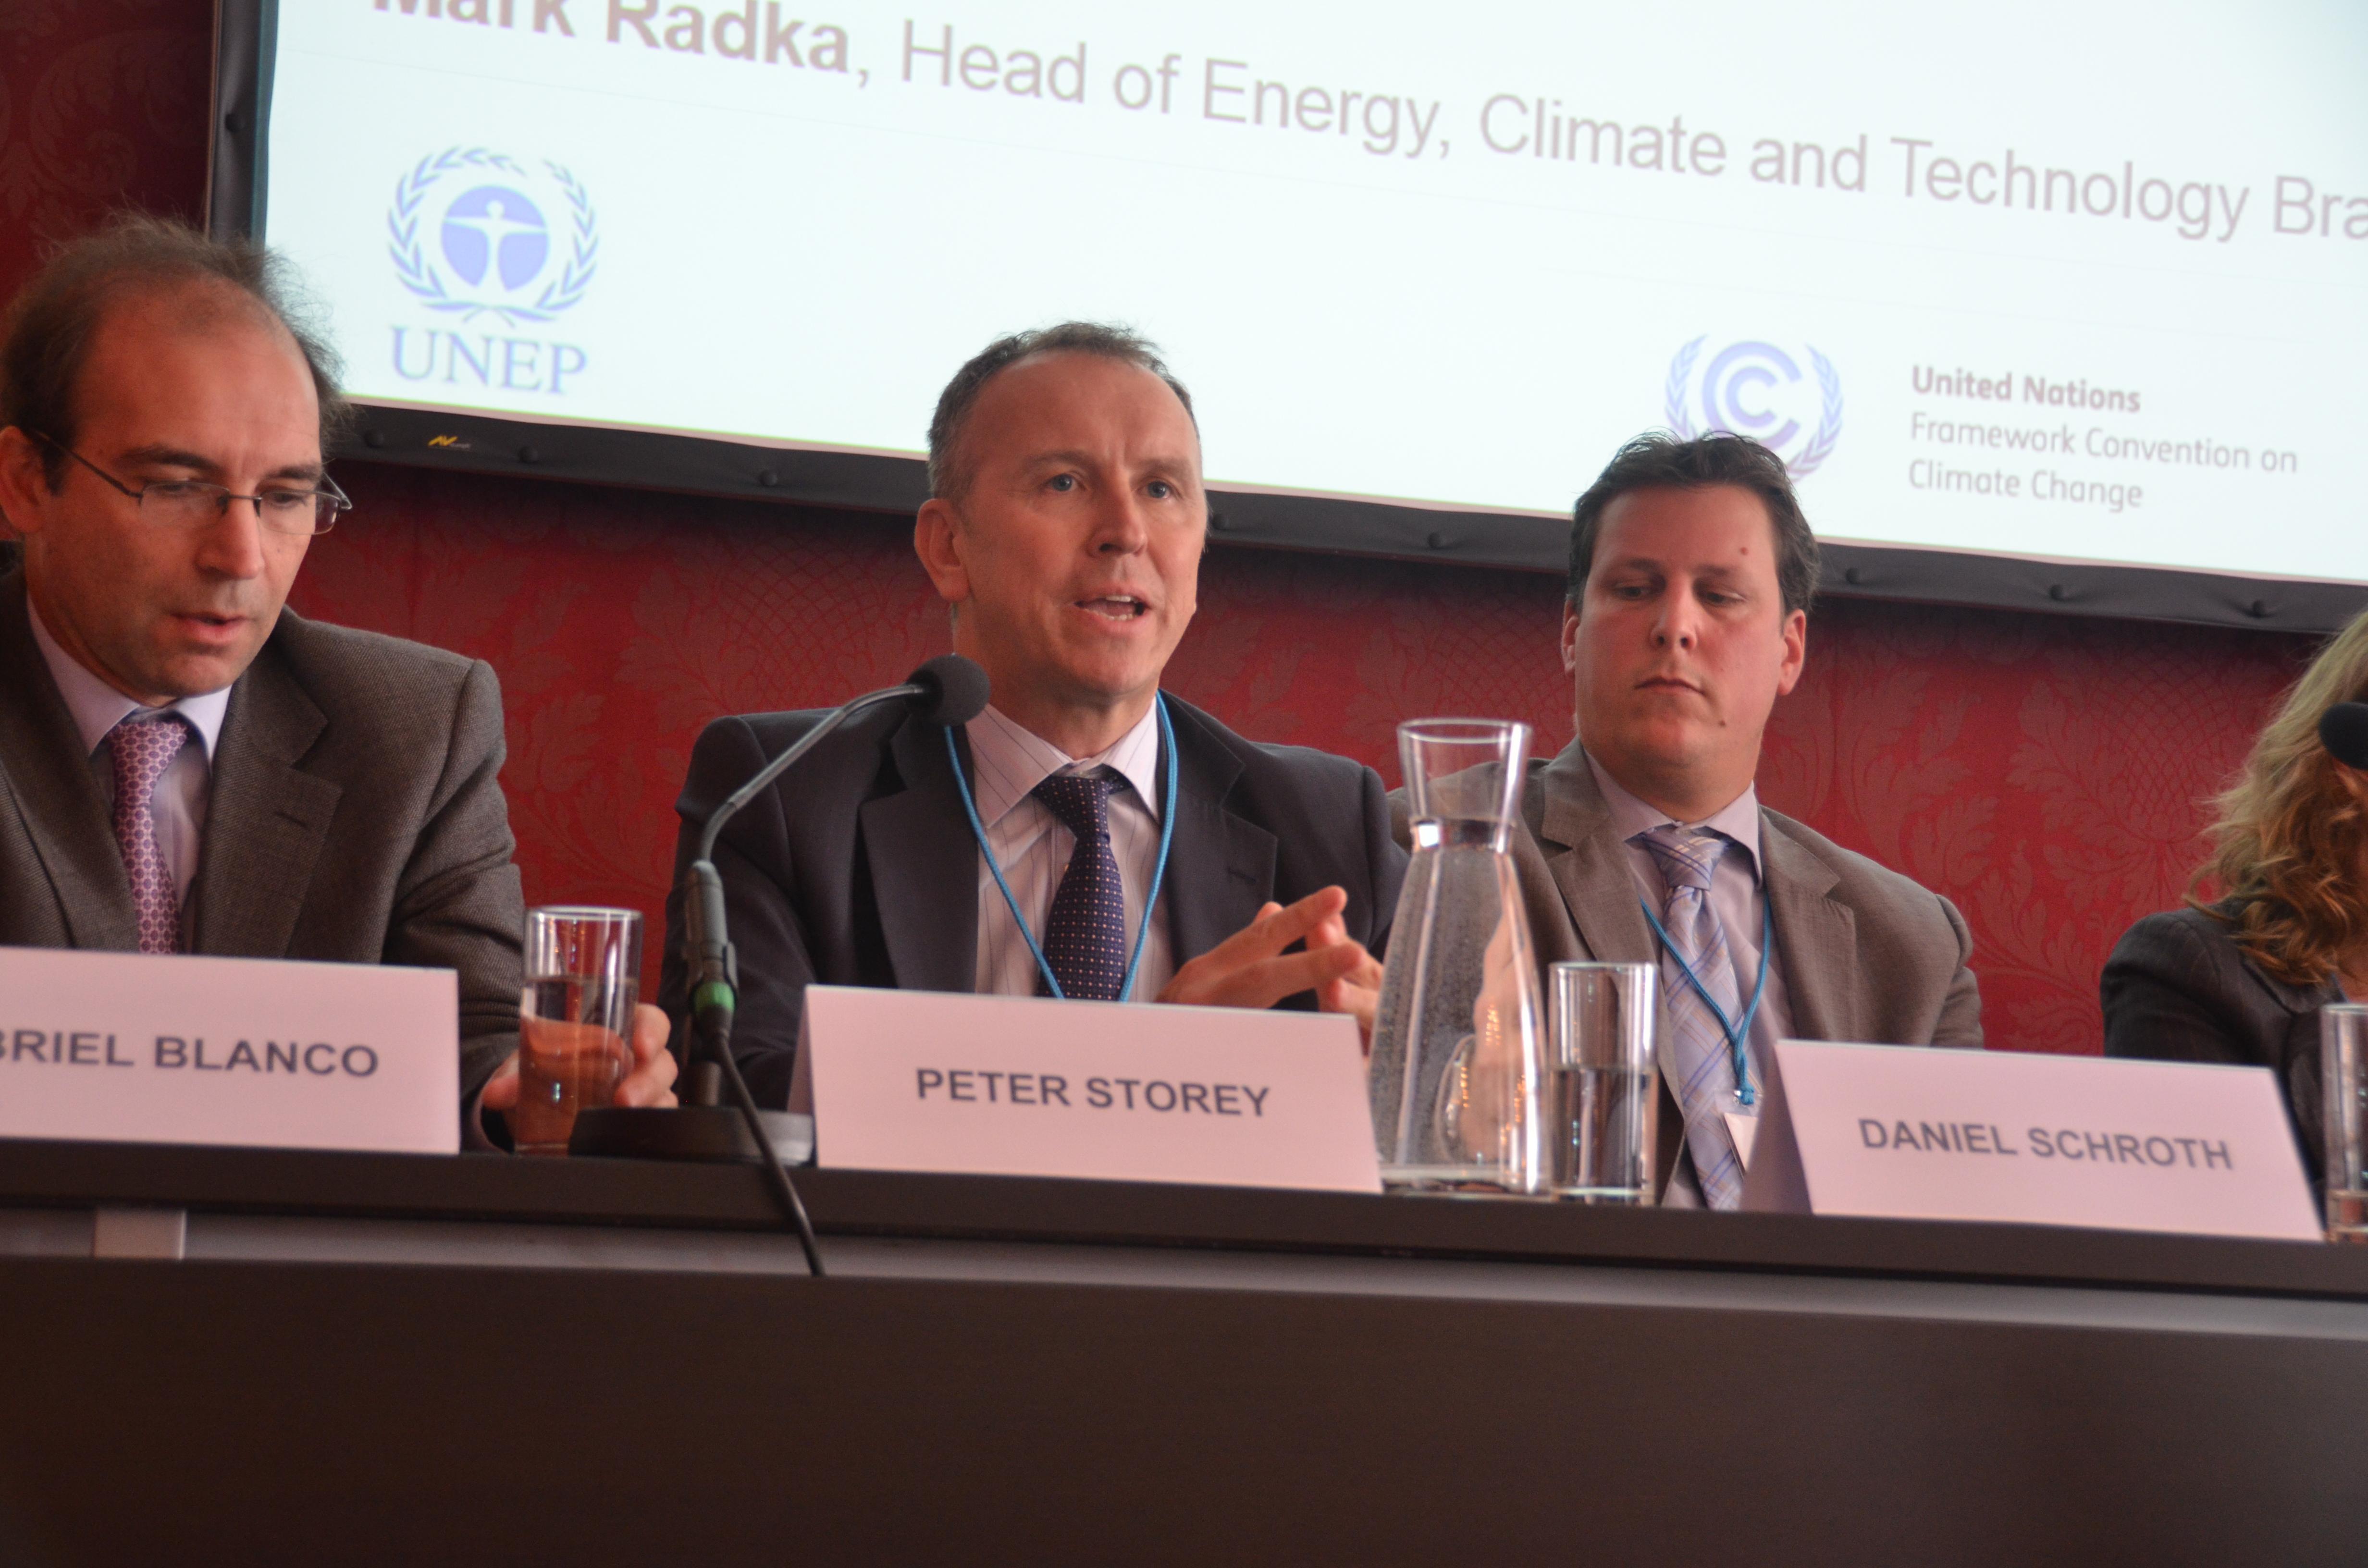 Vienna_Energy_Forum_2015 155.JPG